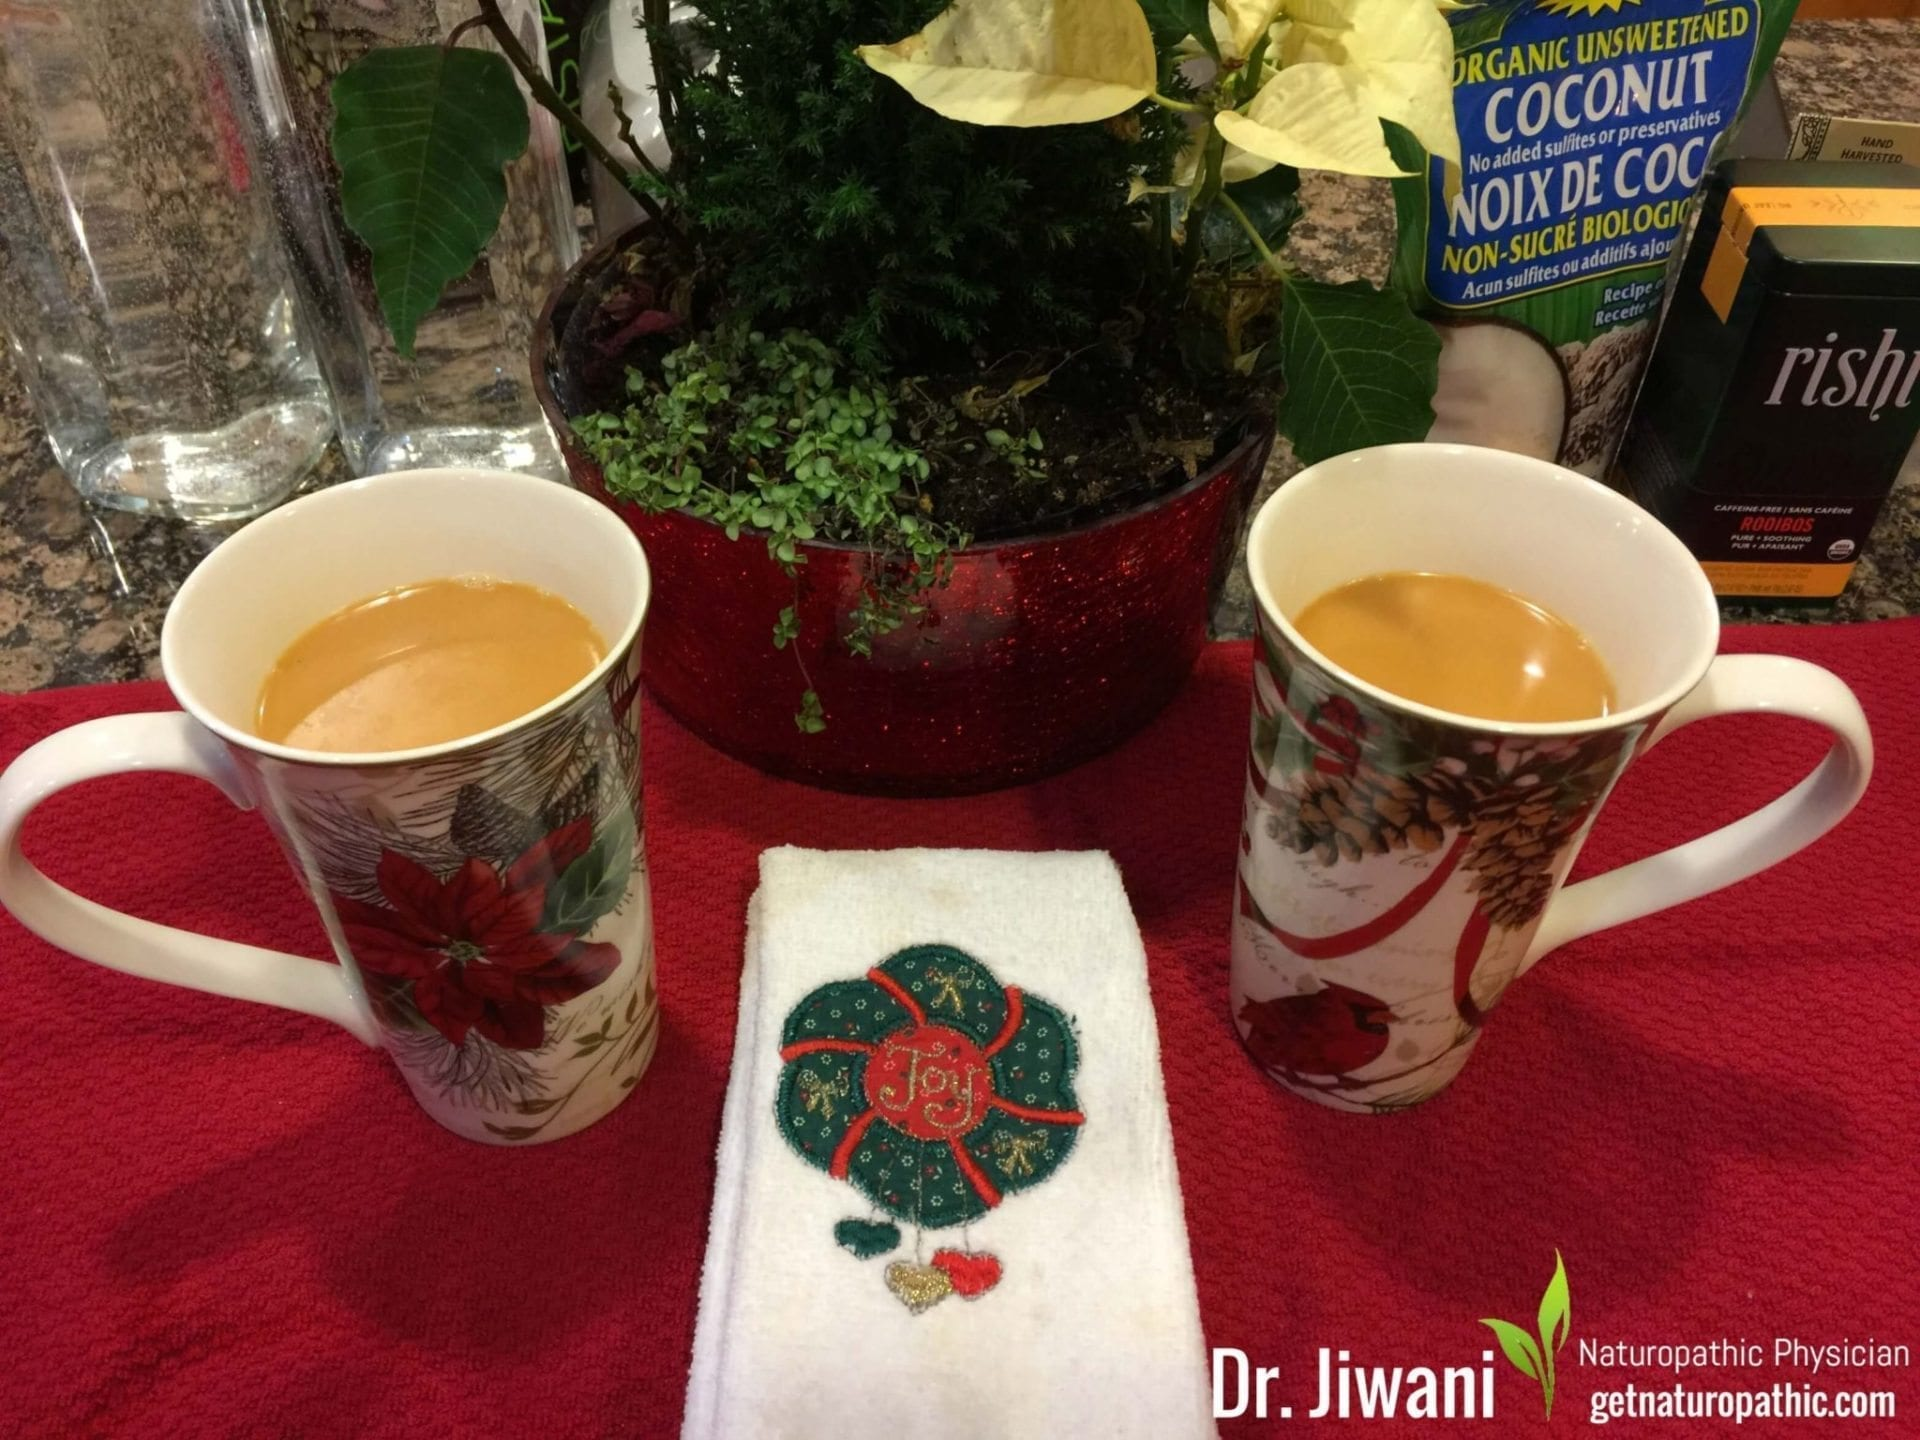 Recipe: Dr. Jiwani's Caffeine-Free Chai Latte